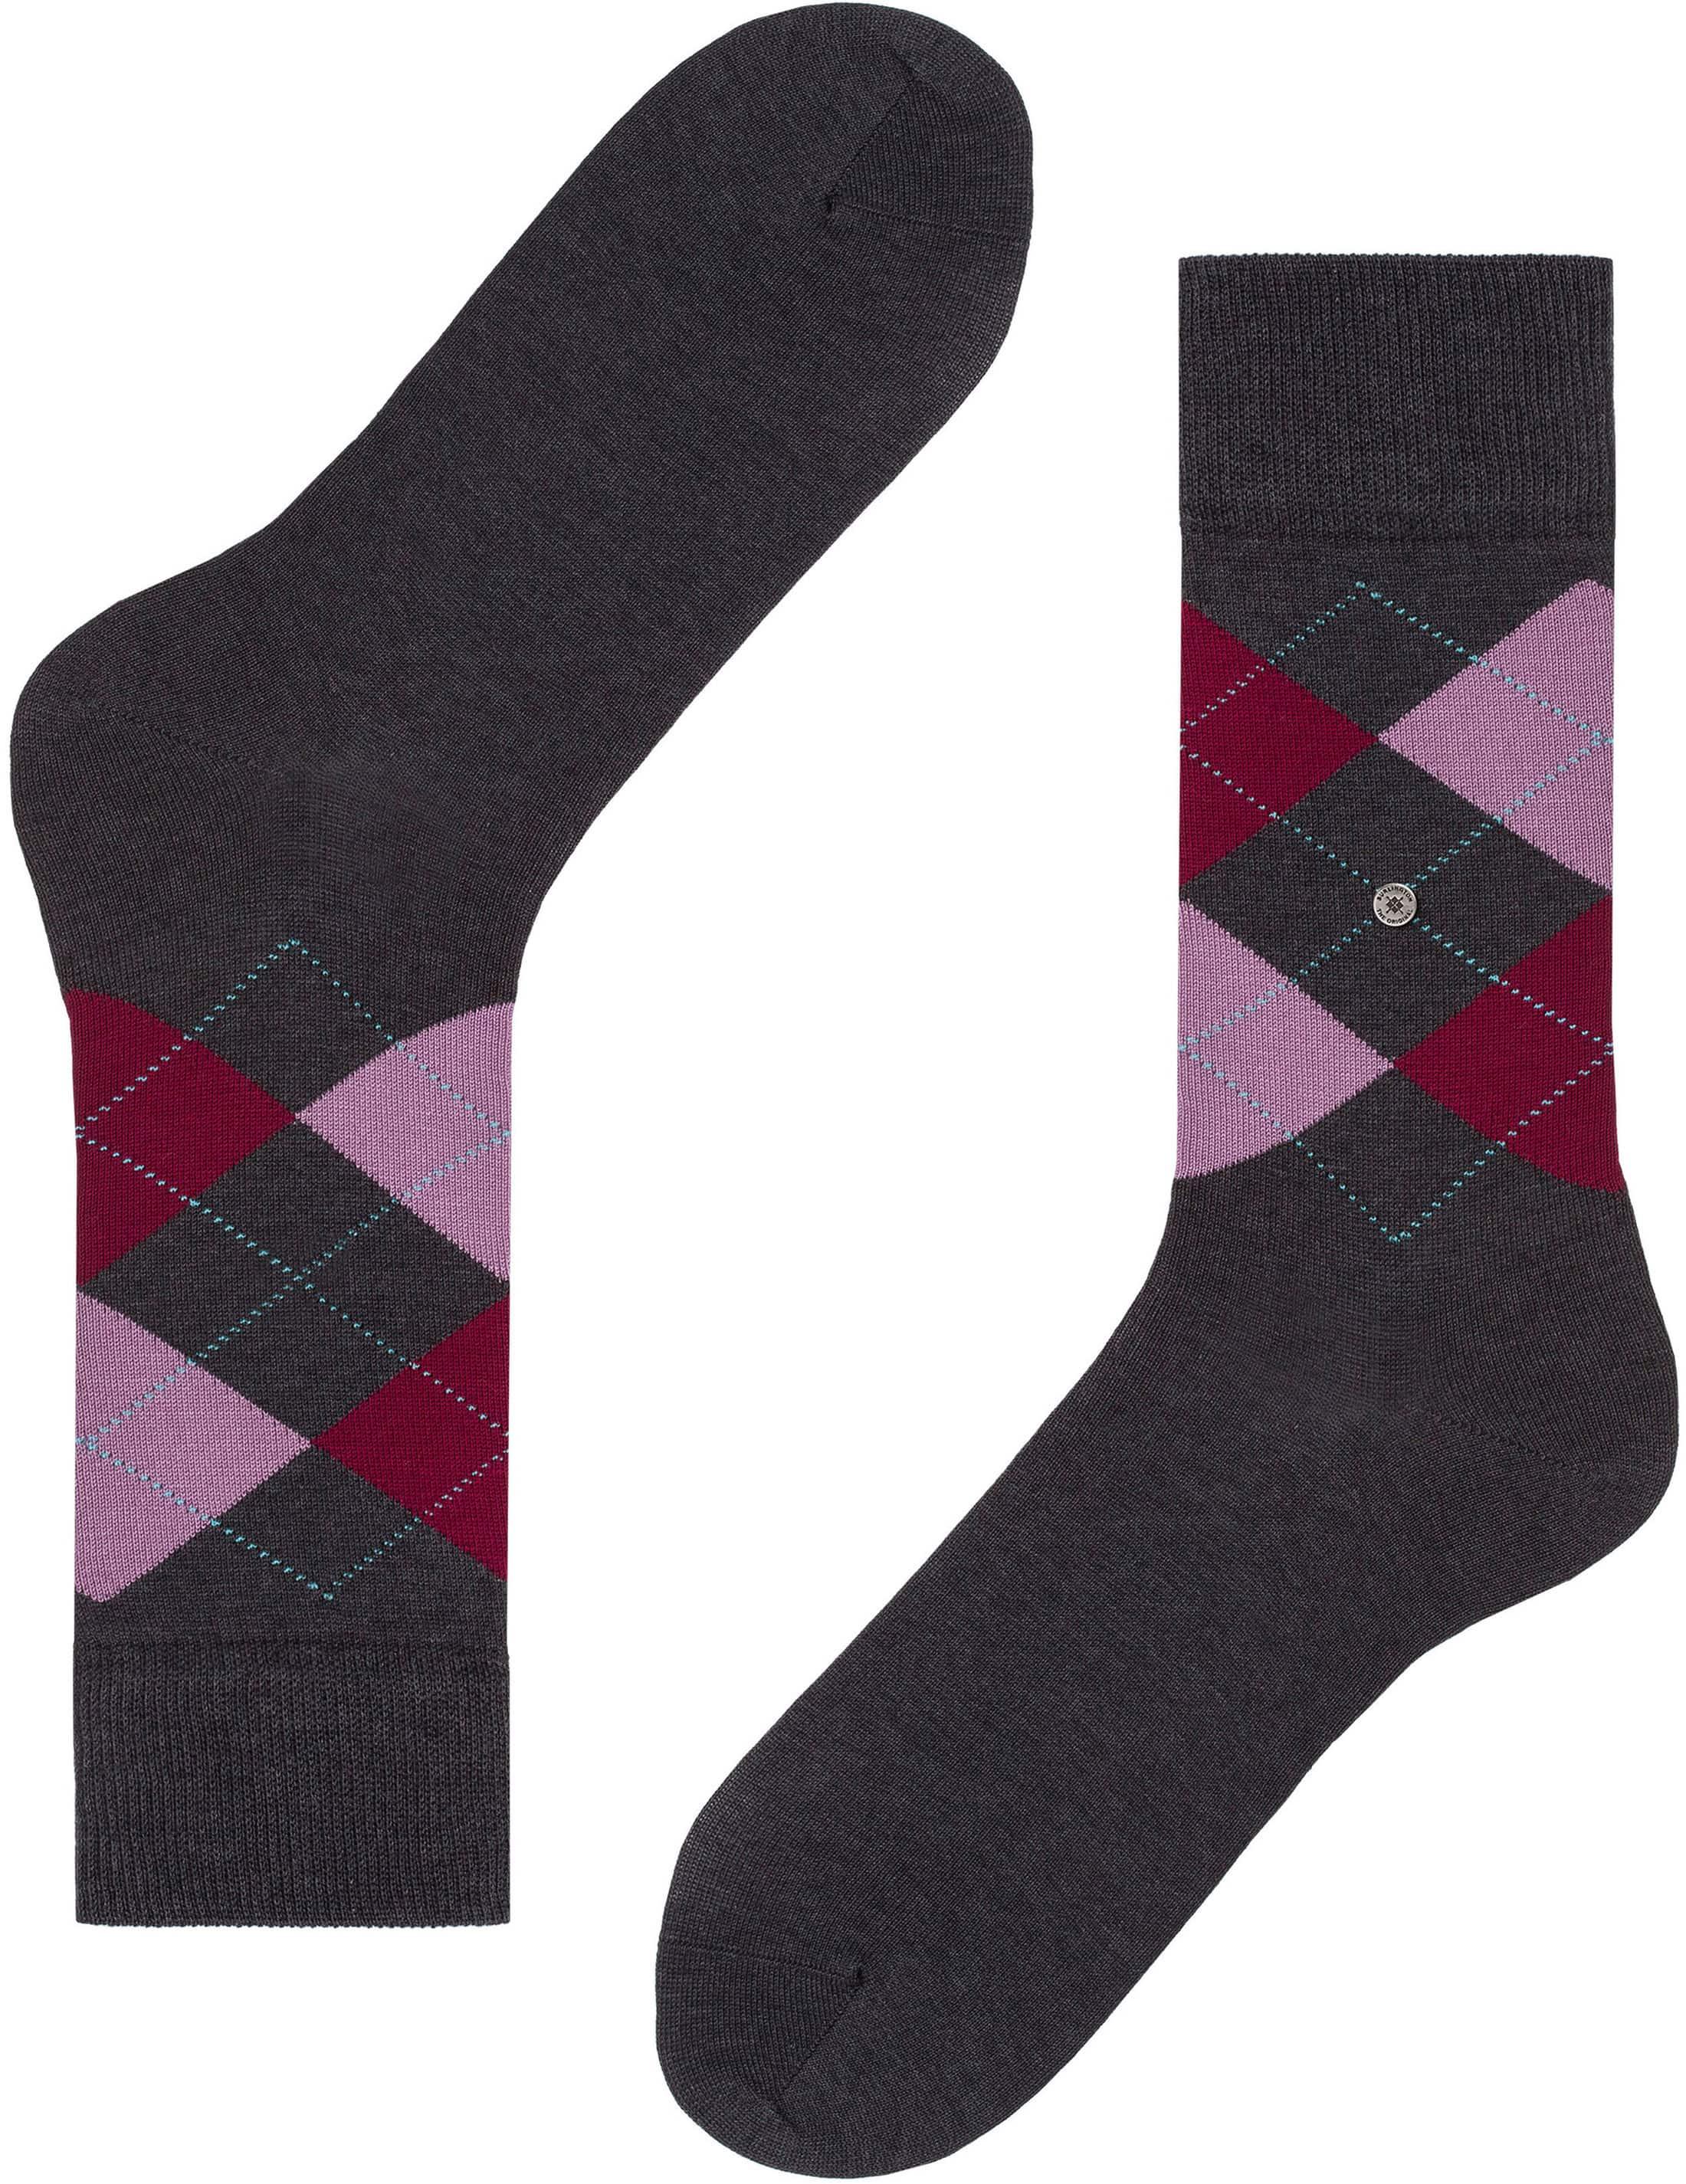 Burlington Socks Manchester 3102 foto 3